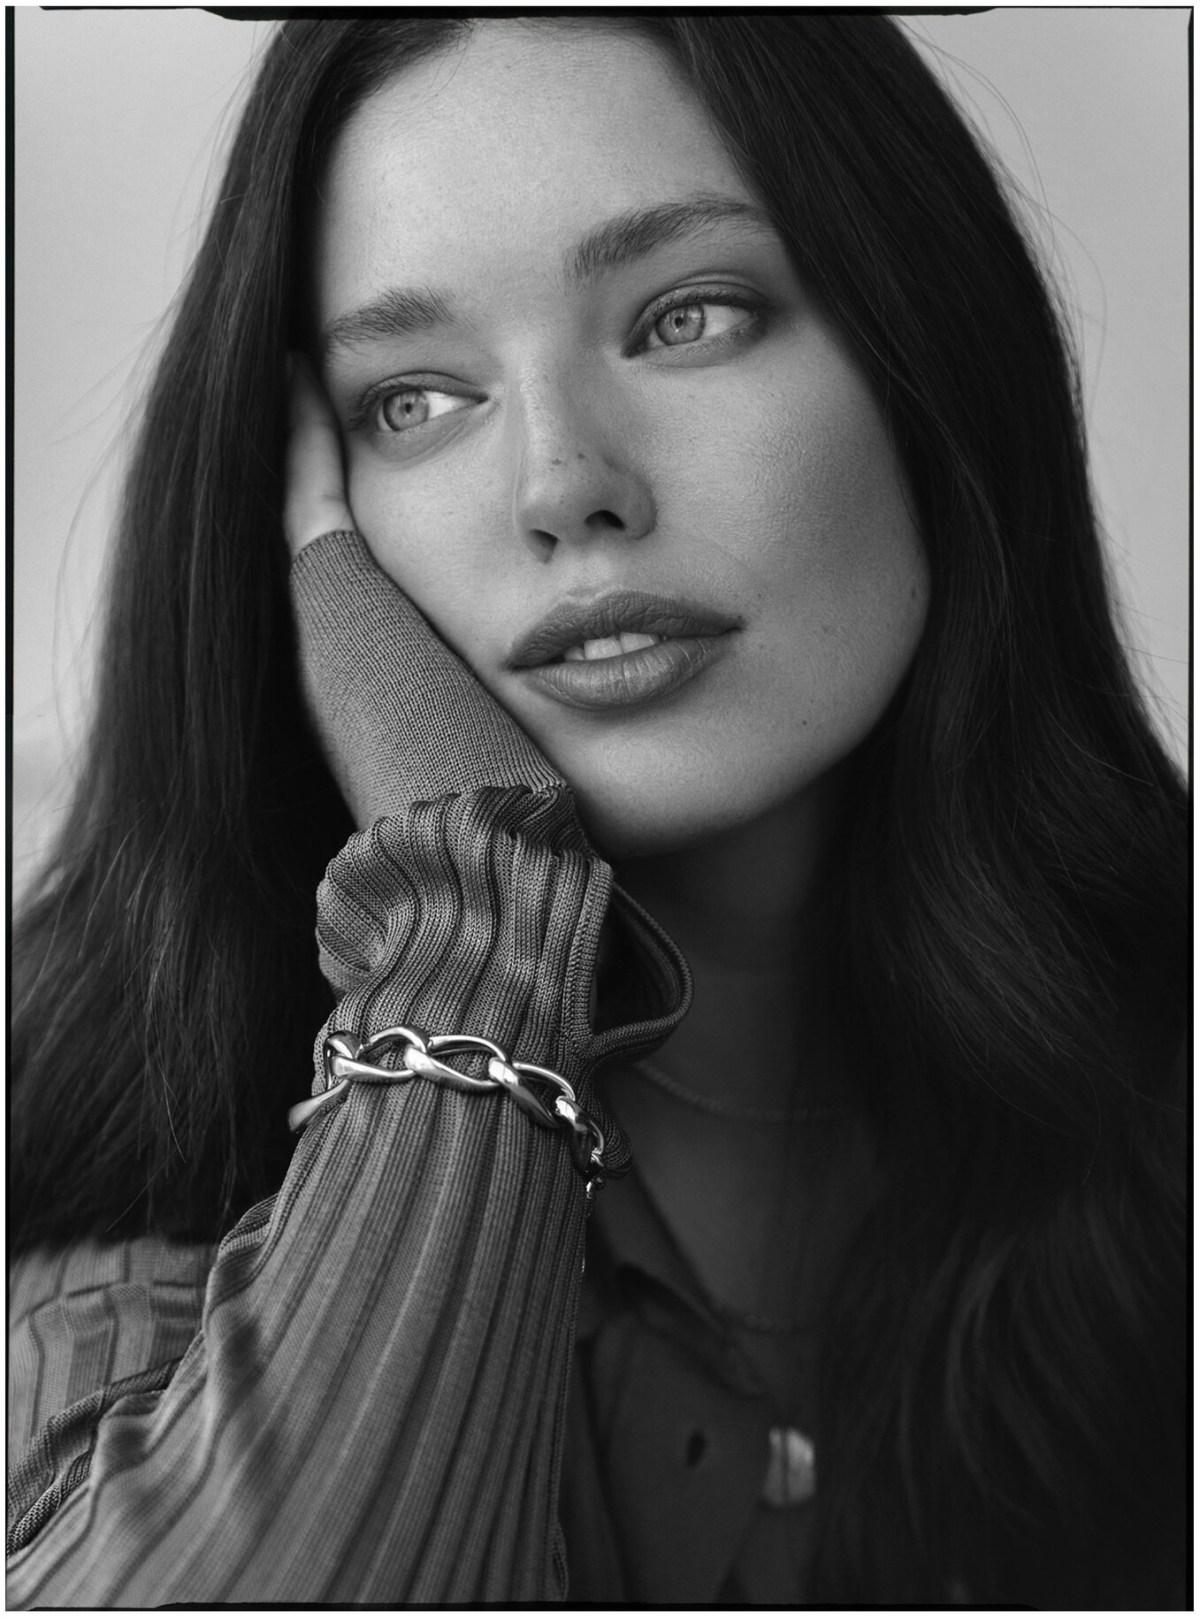 Emily DiDonato by Elias Tahan